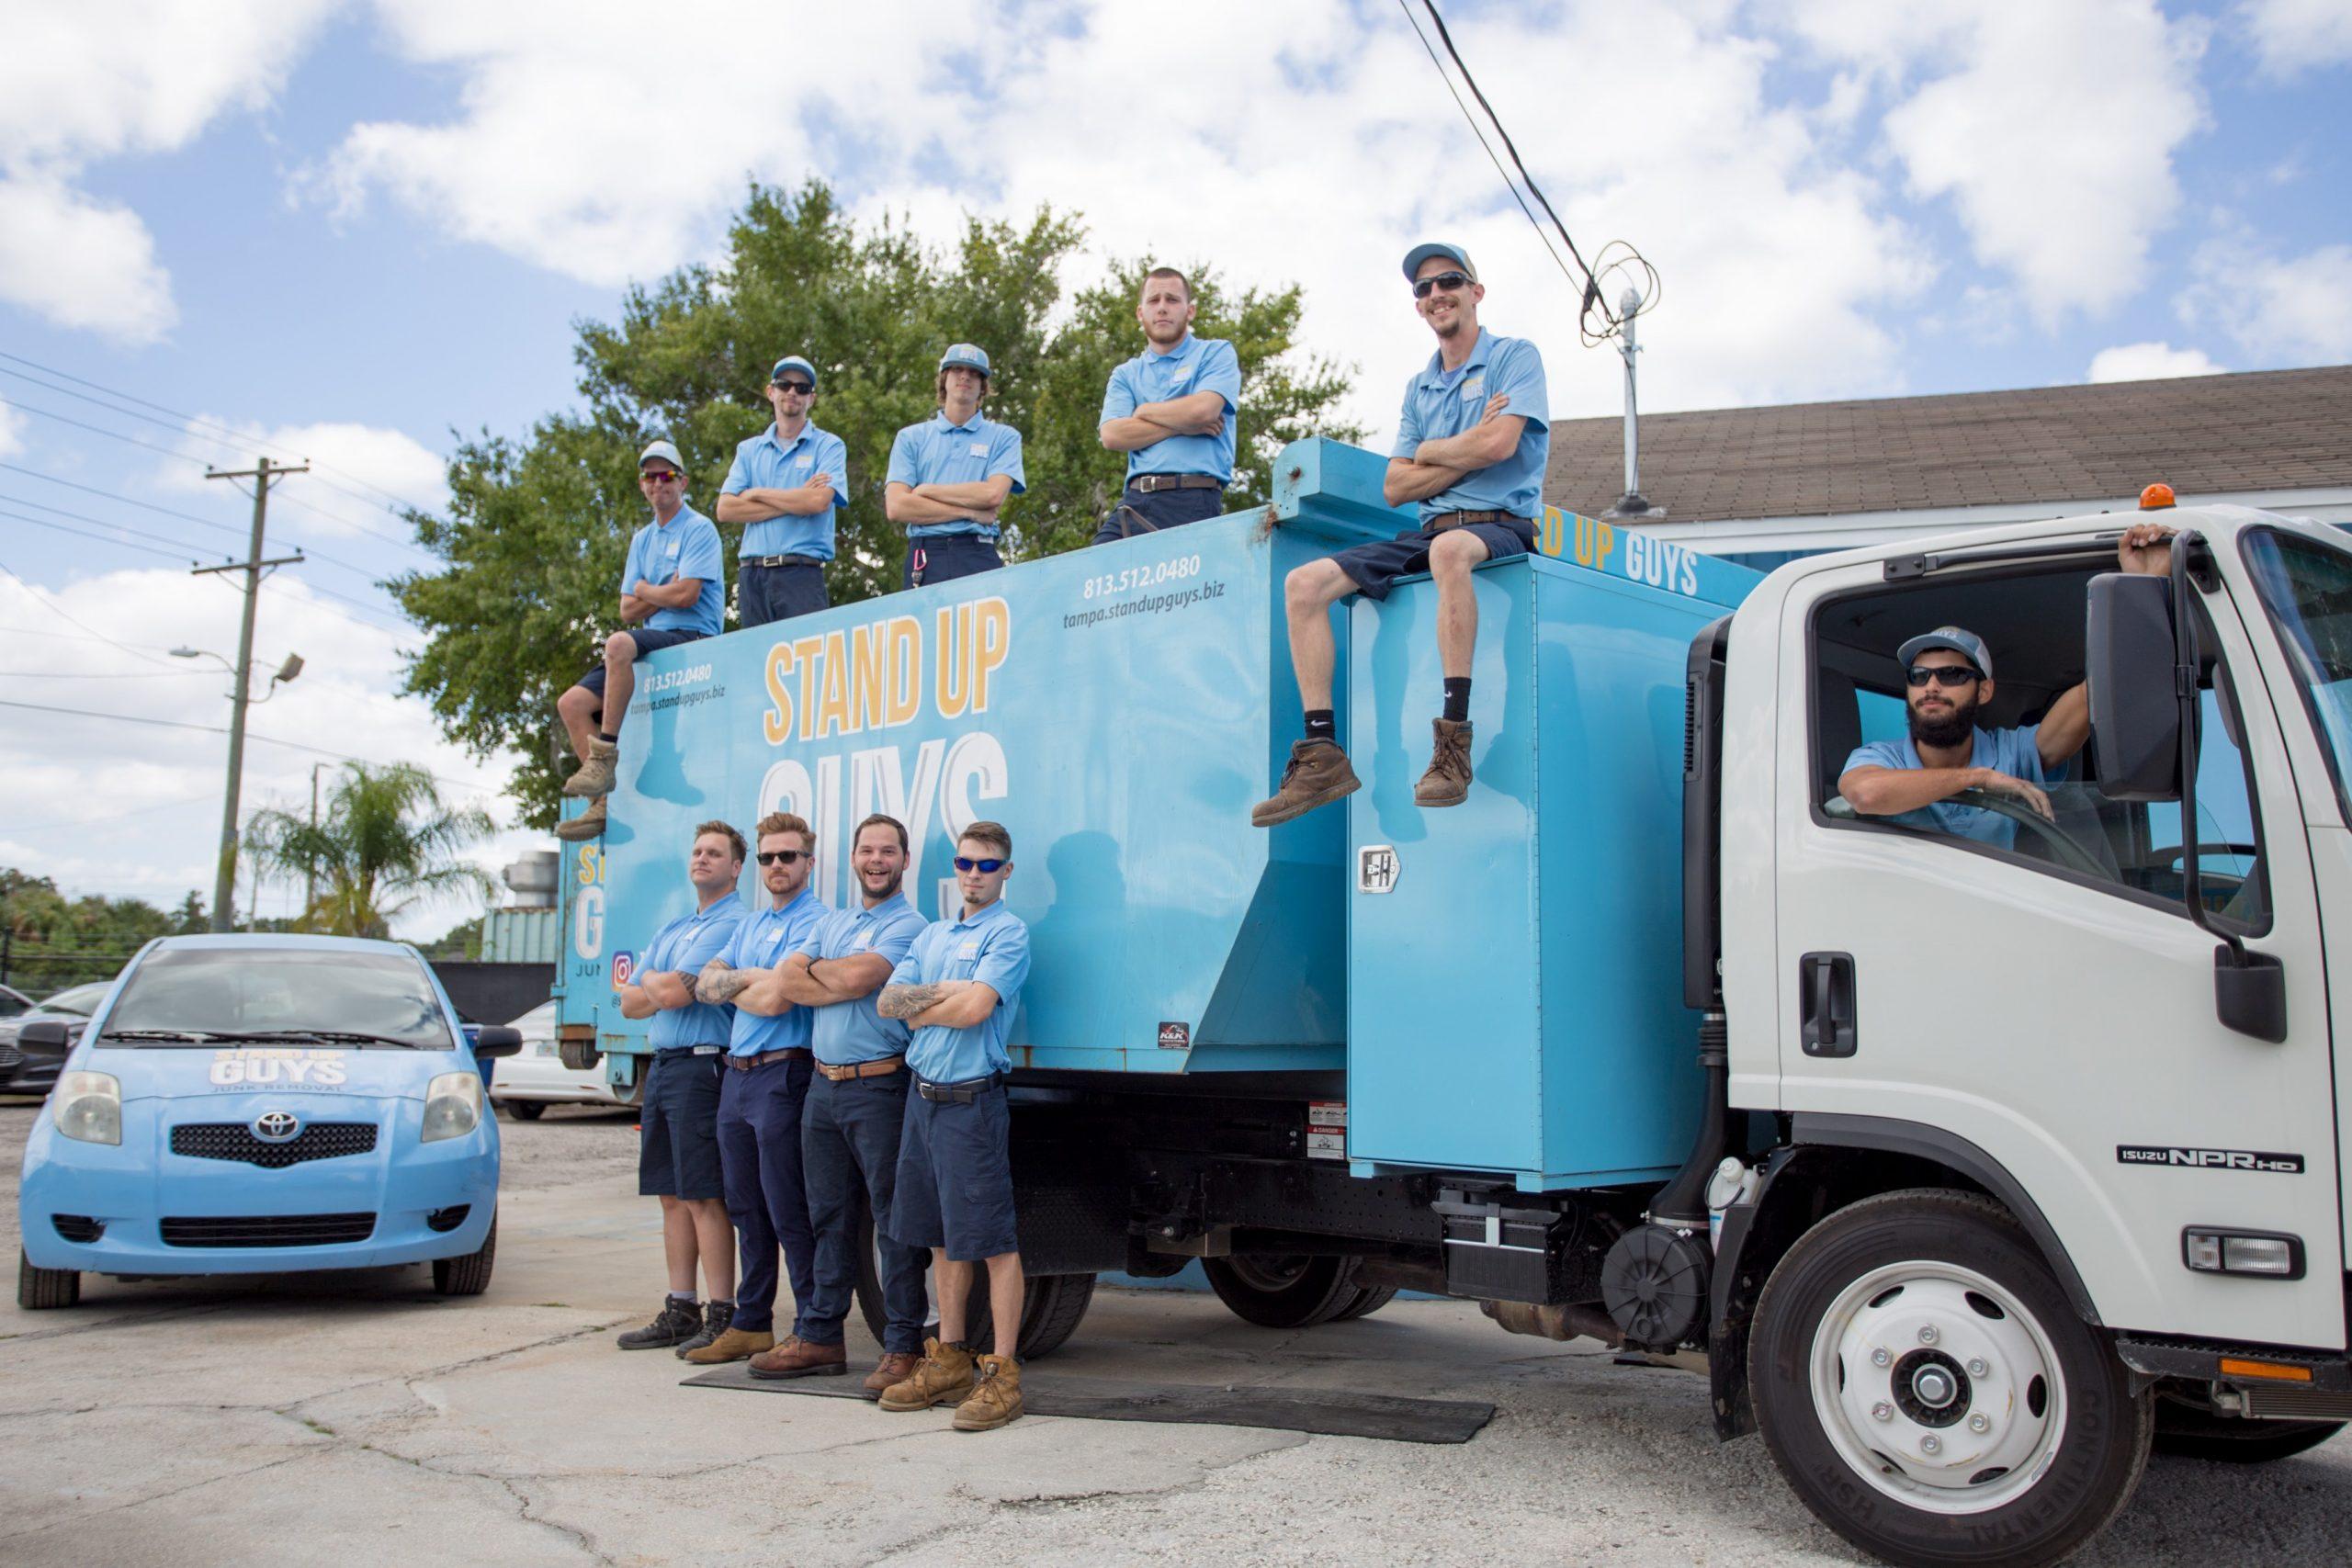 Maitland junk removal crew